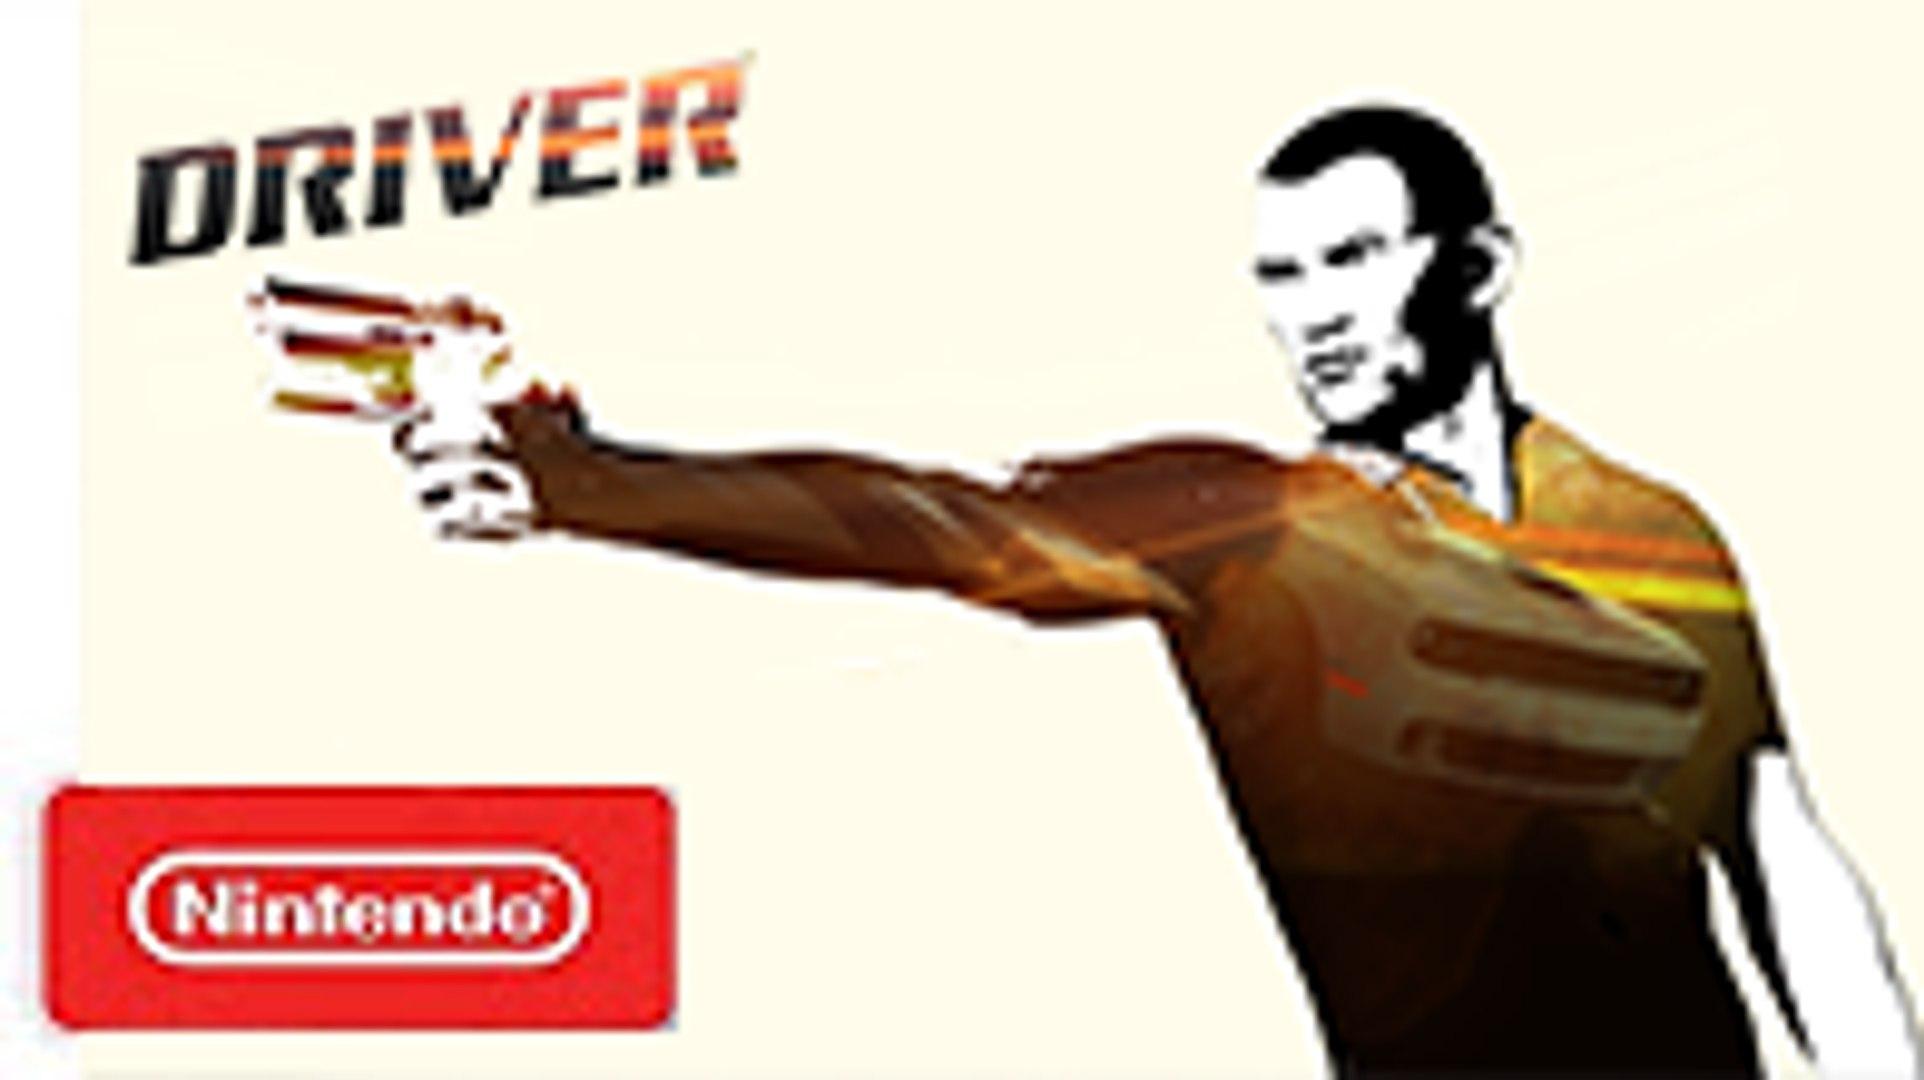 Driver Teaser – Nintendo Switch Trailer